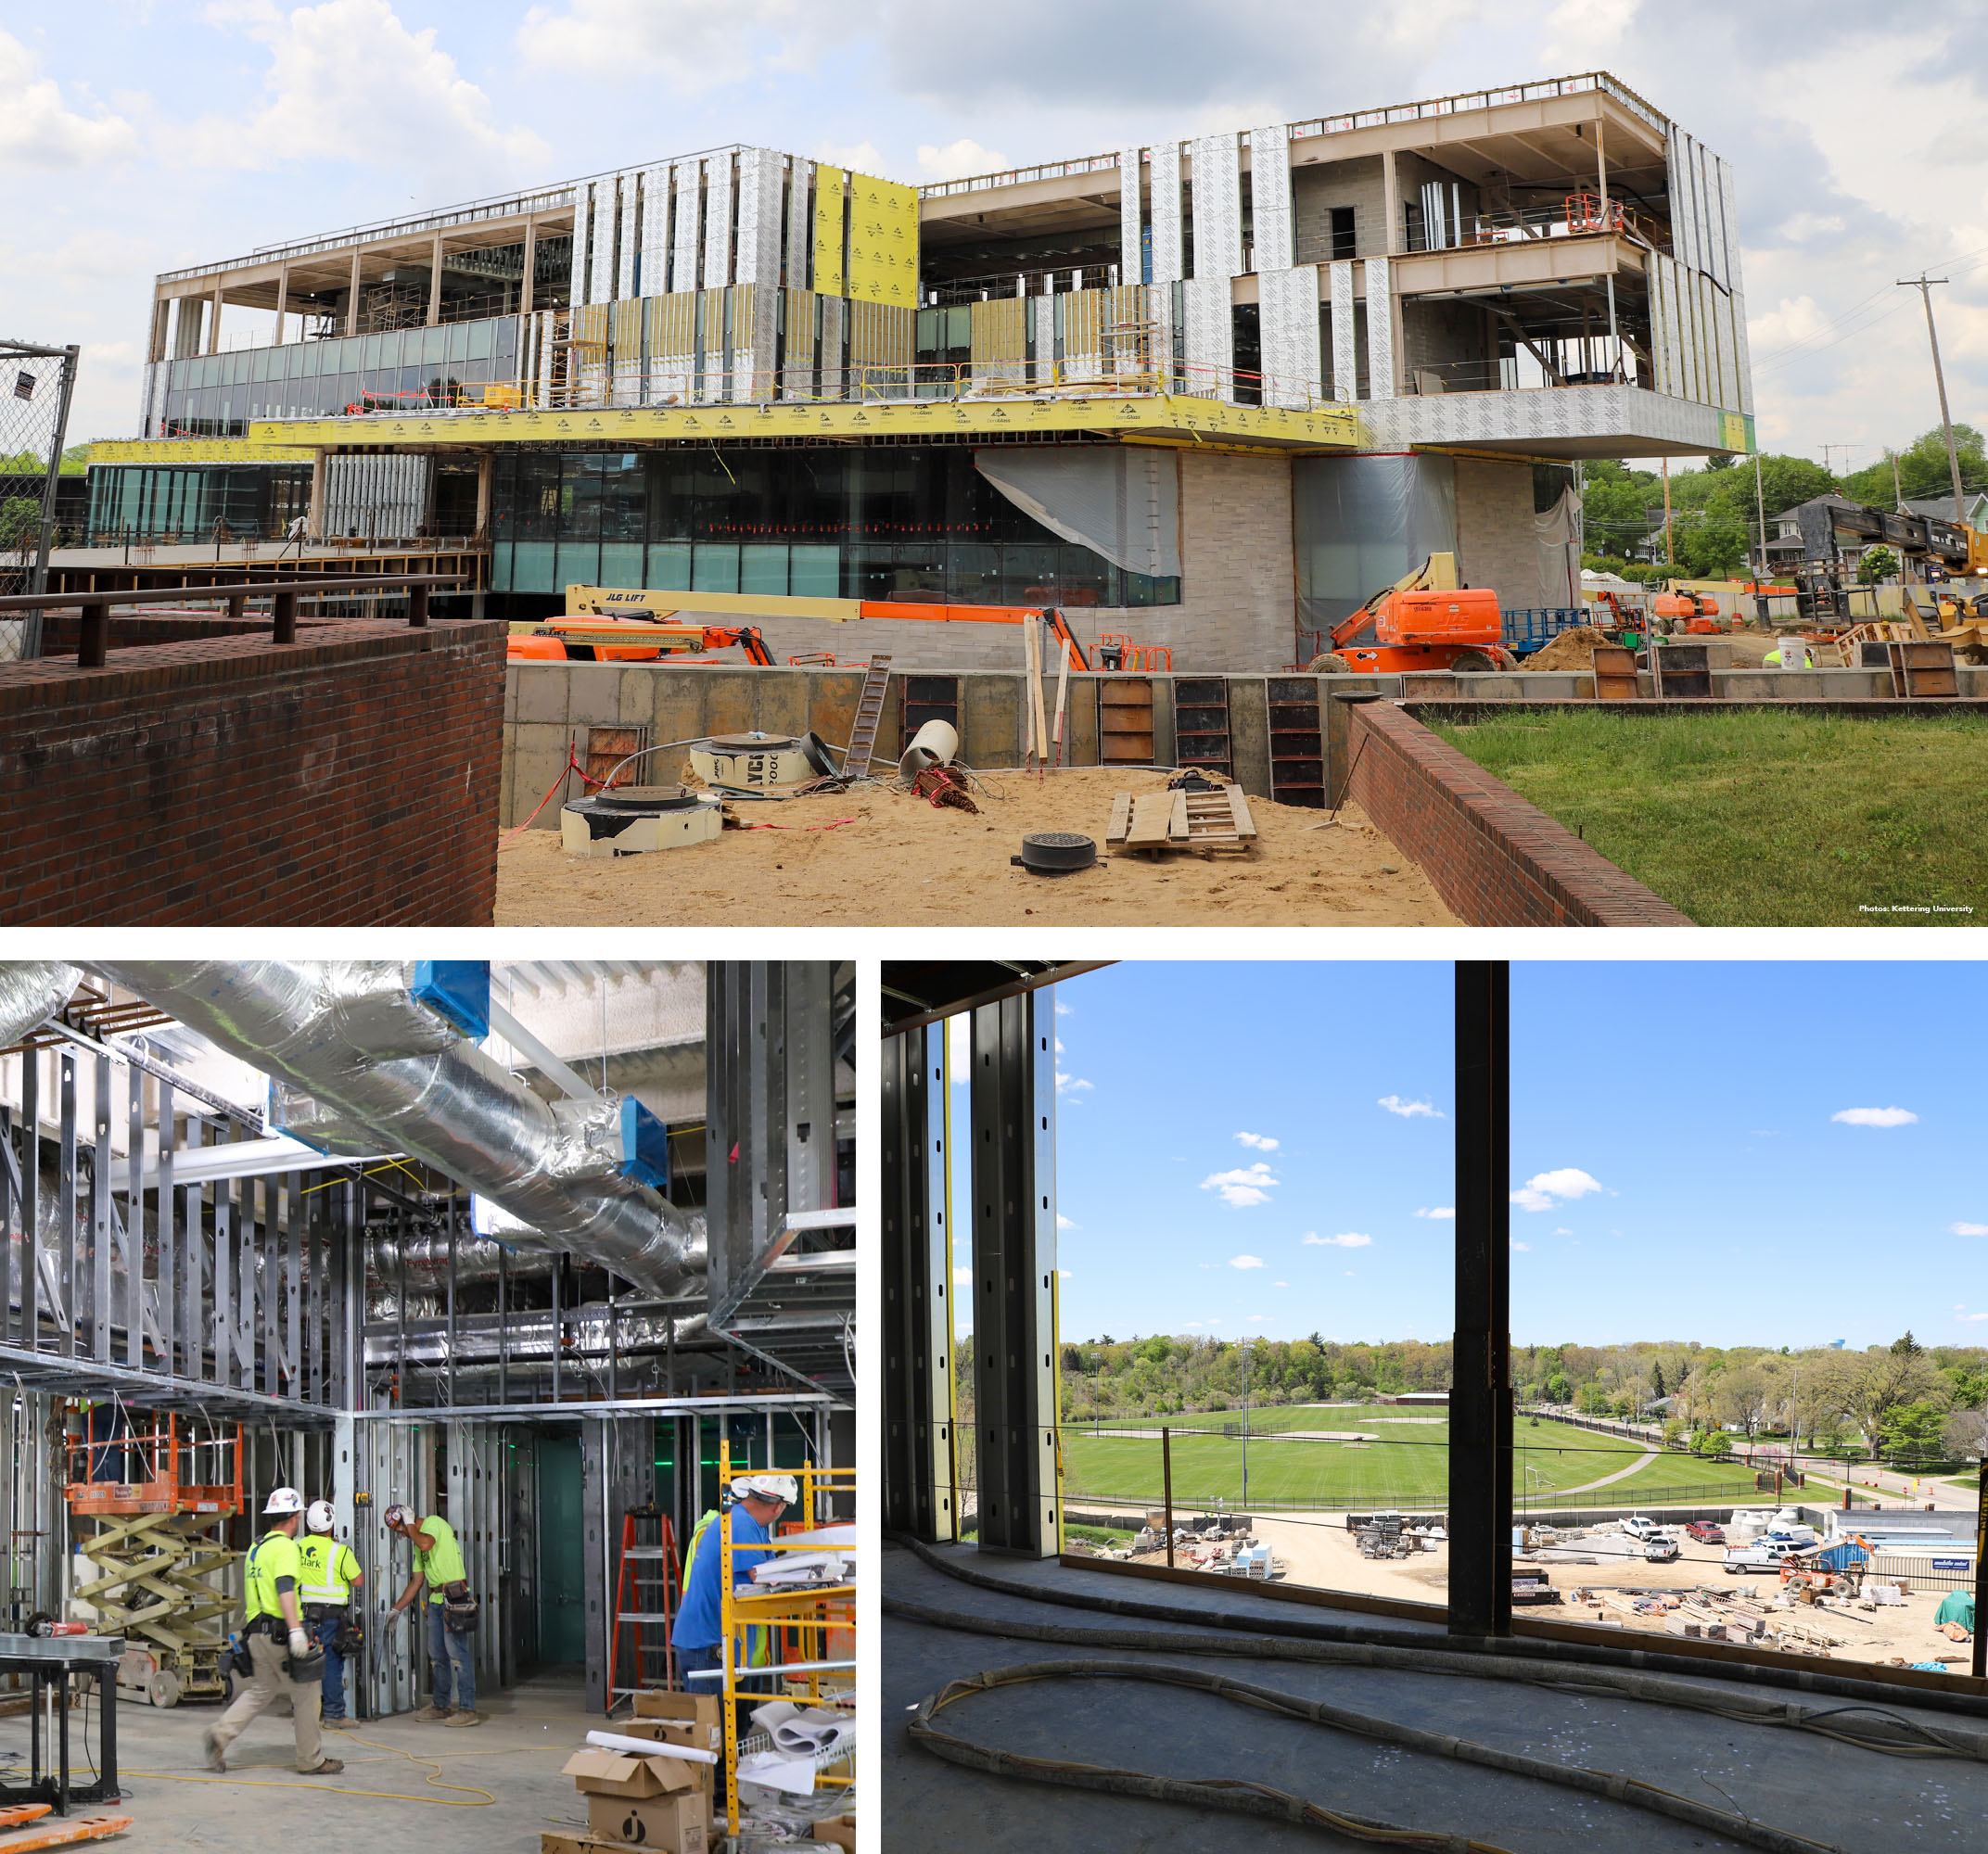 Construction of Kettering University's new learning center